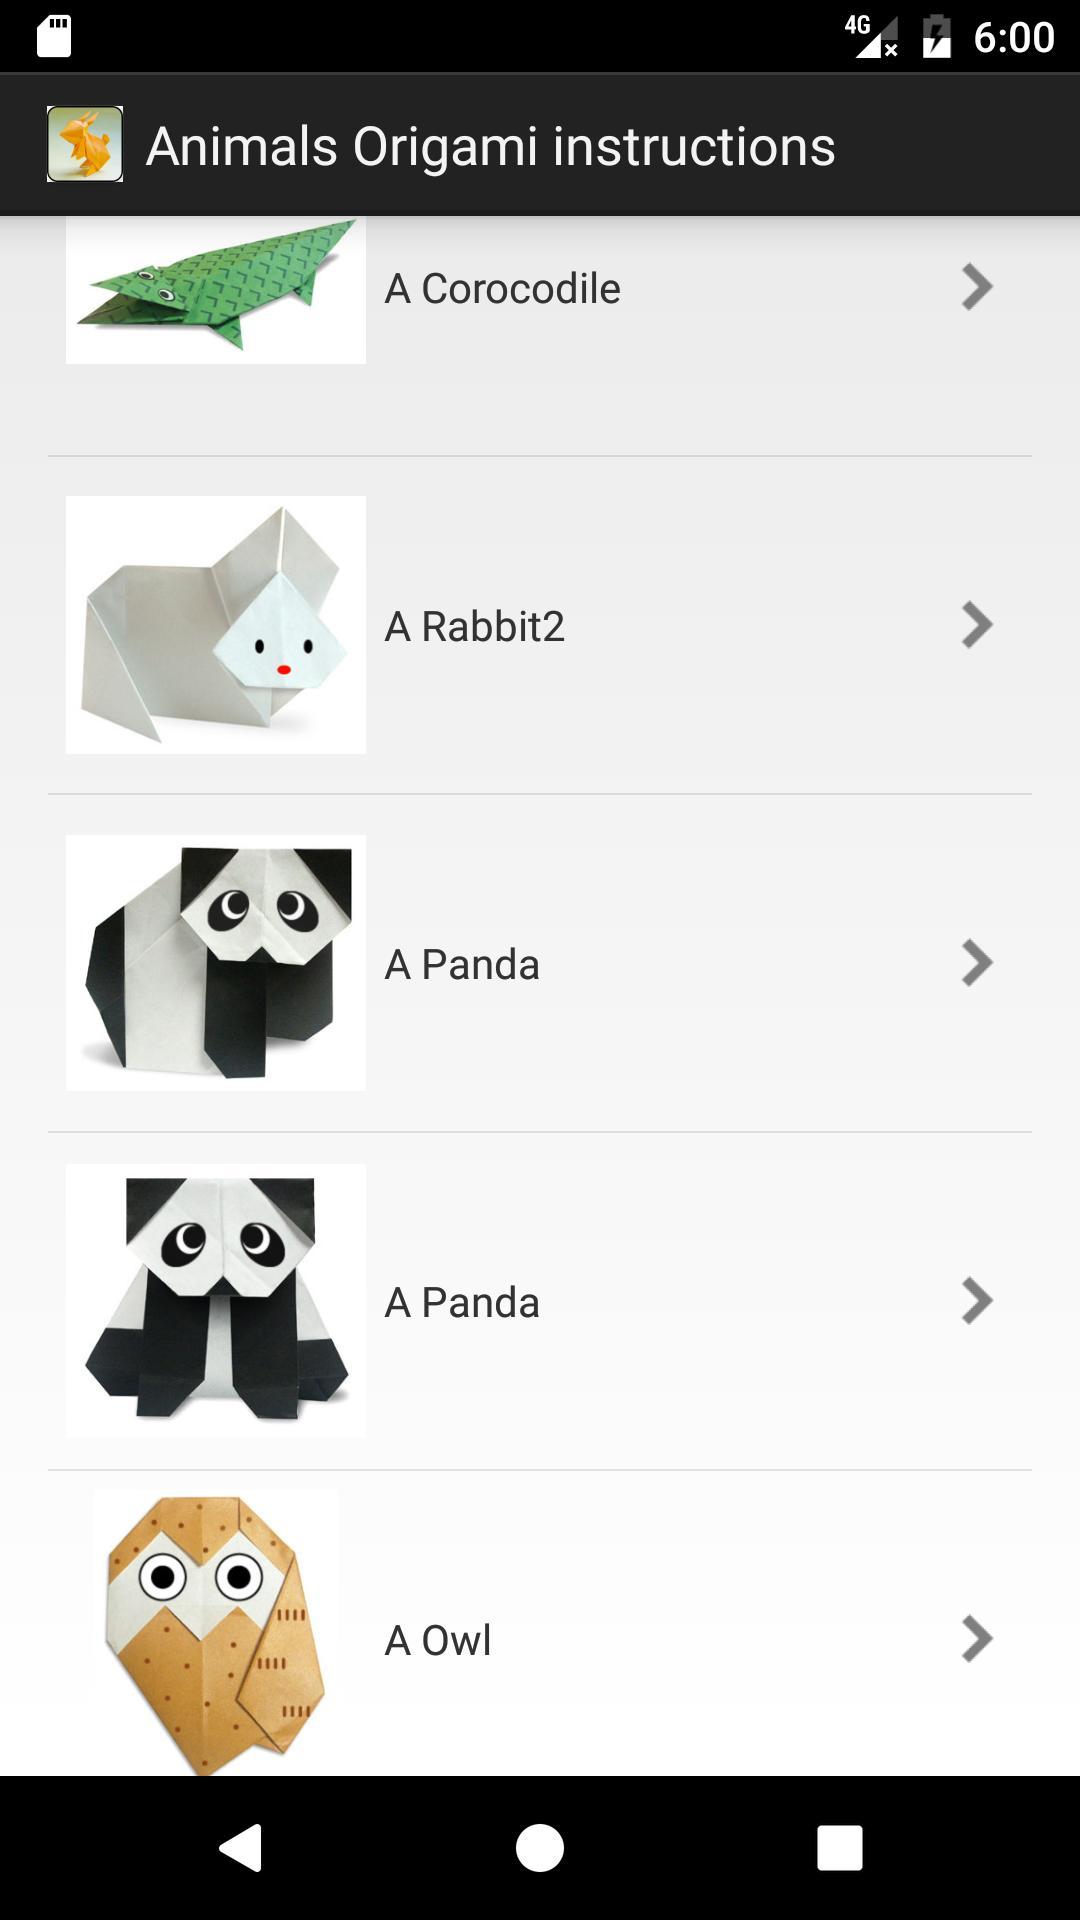 How to Make an Easy Origami Panda | 1920x1080